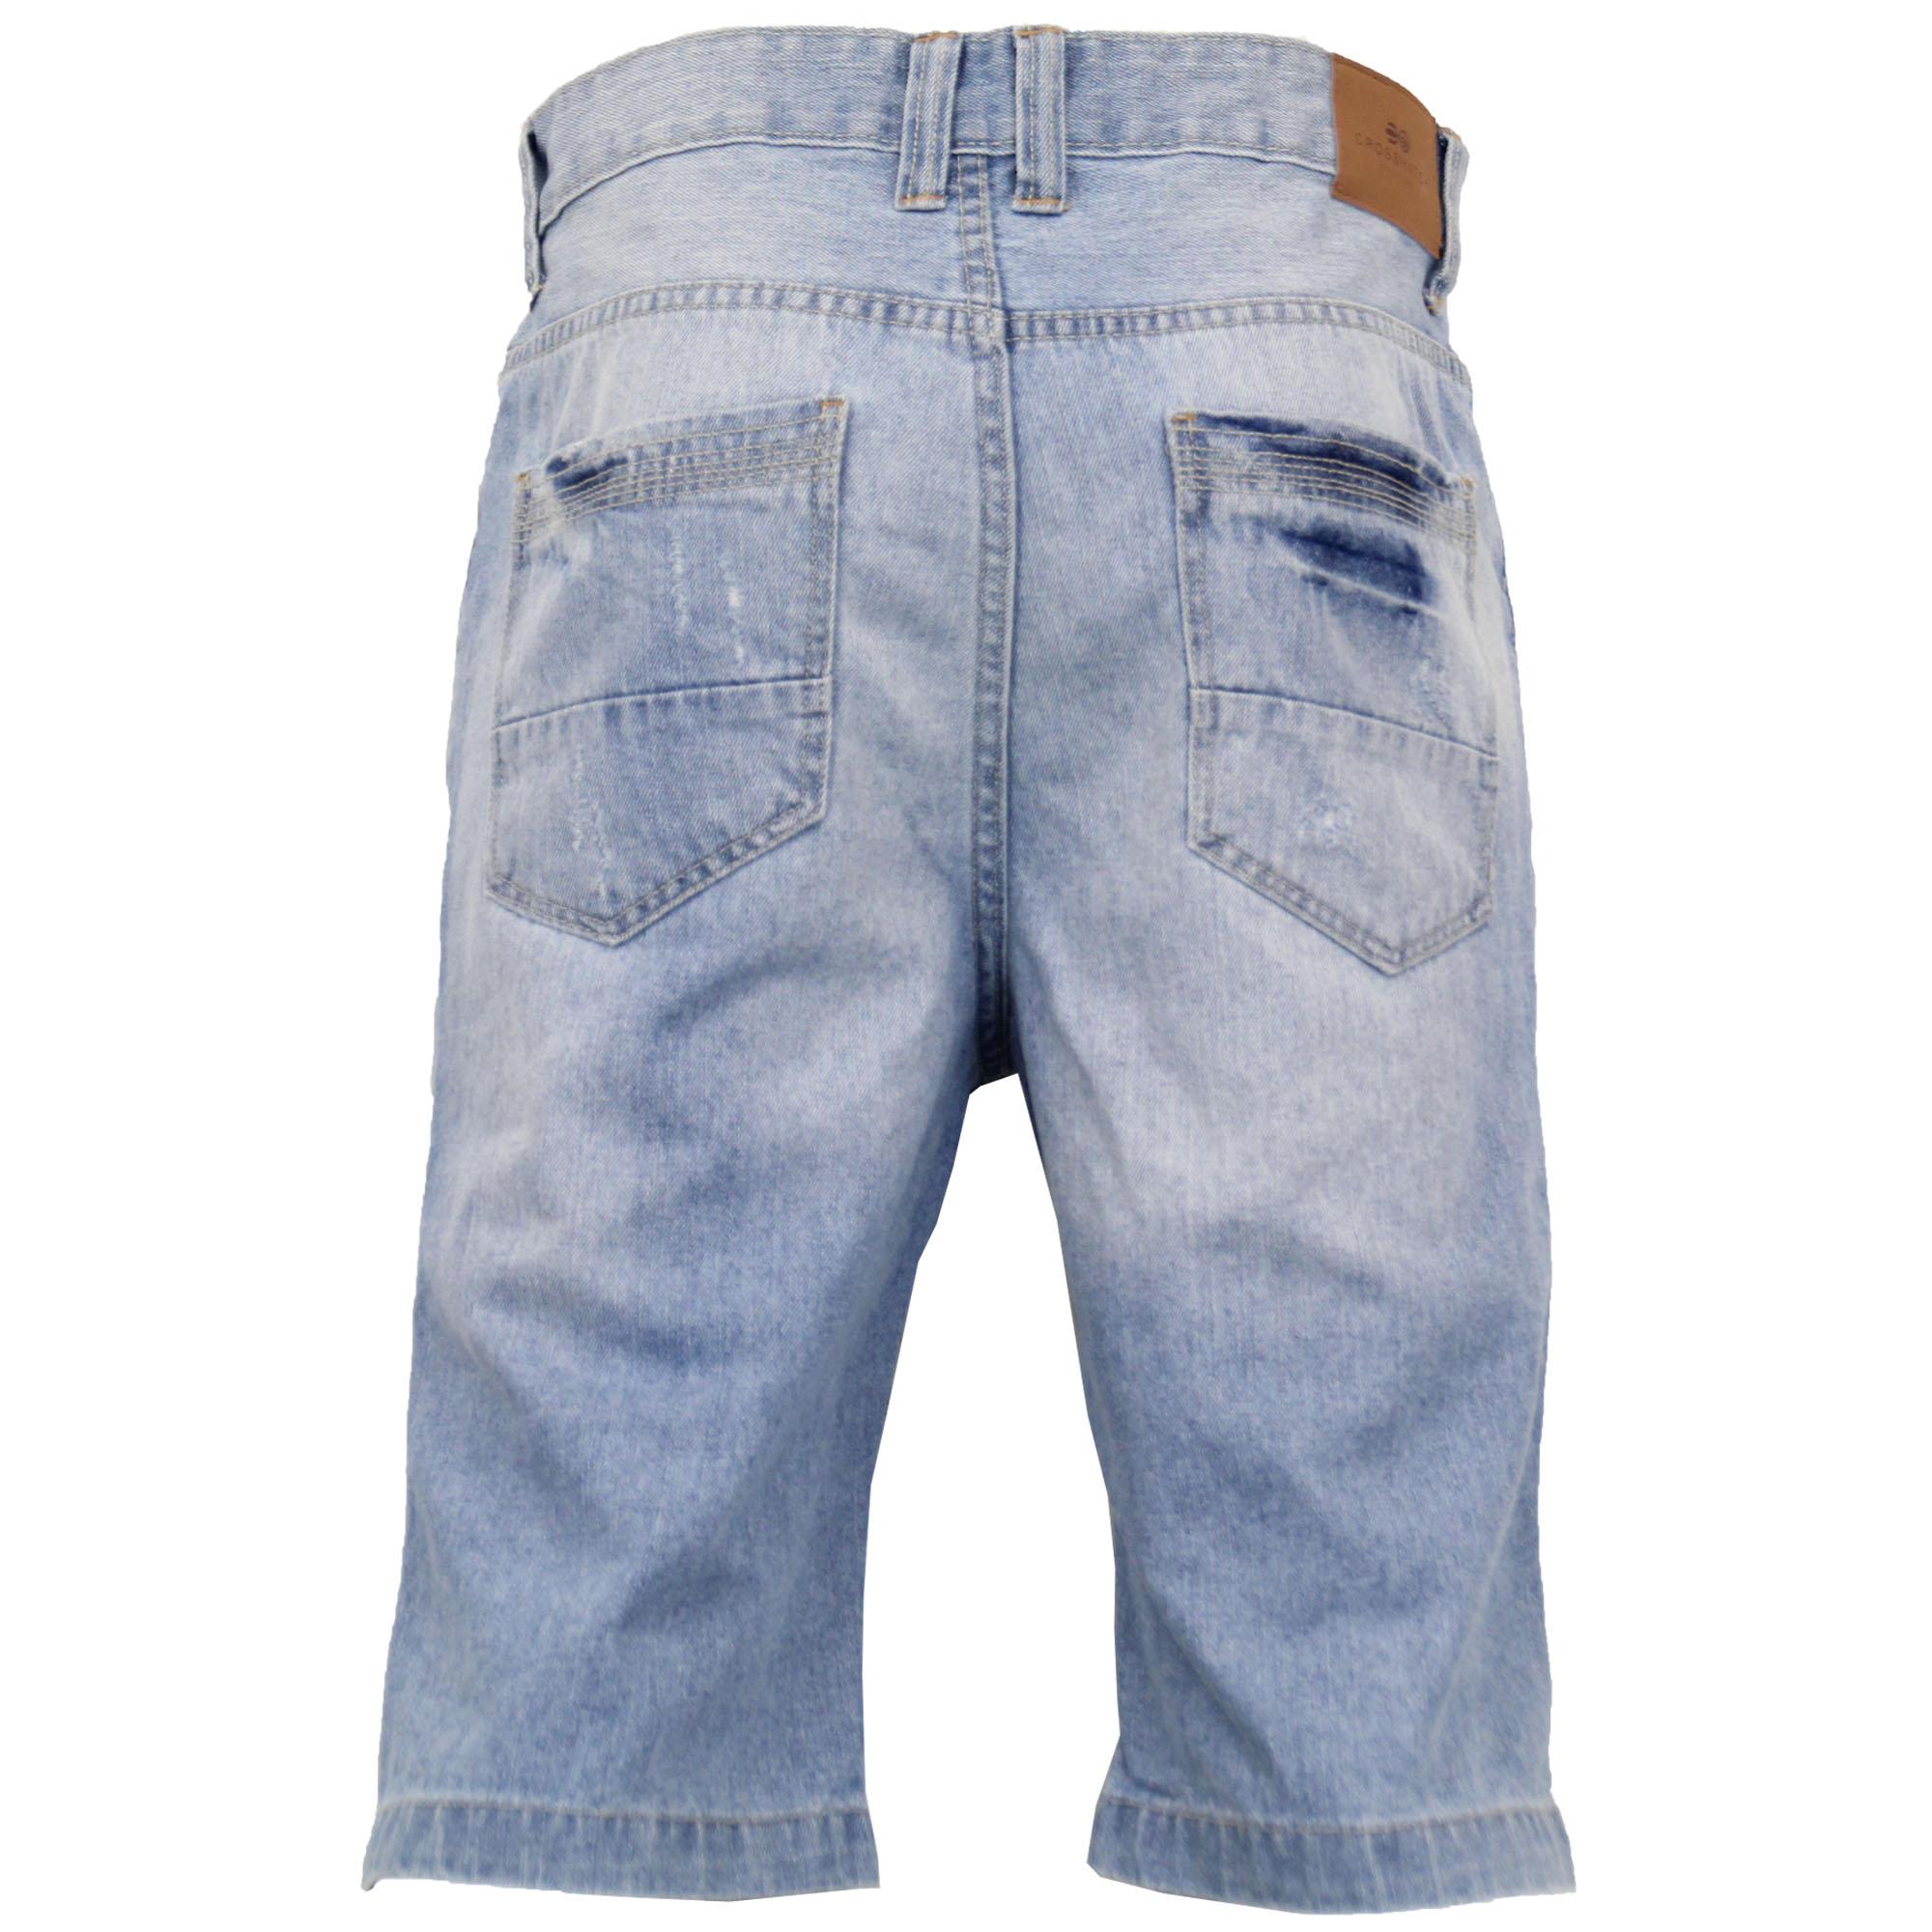 Mens-Crosshatch-Denim-Knee-Length-Combat-Shorts-Cargo-Casual-Fashion-Summer-New 縮圖 43